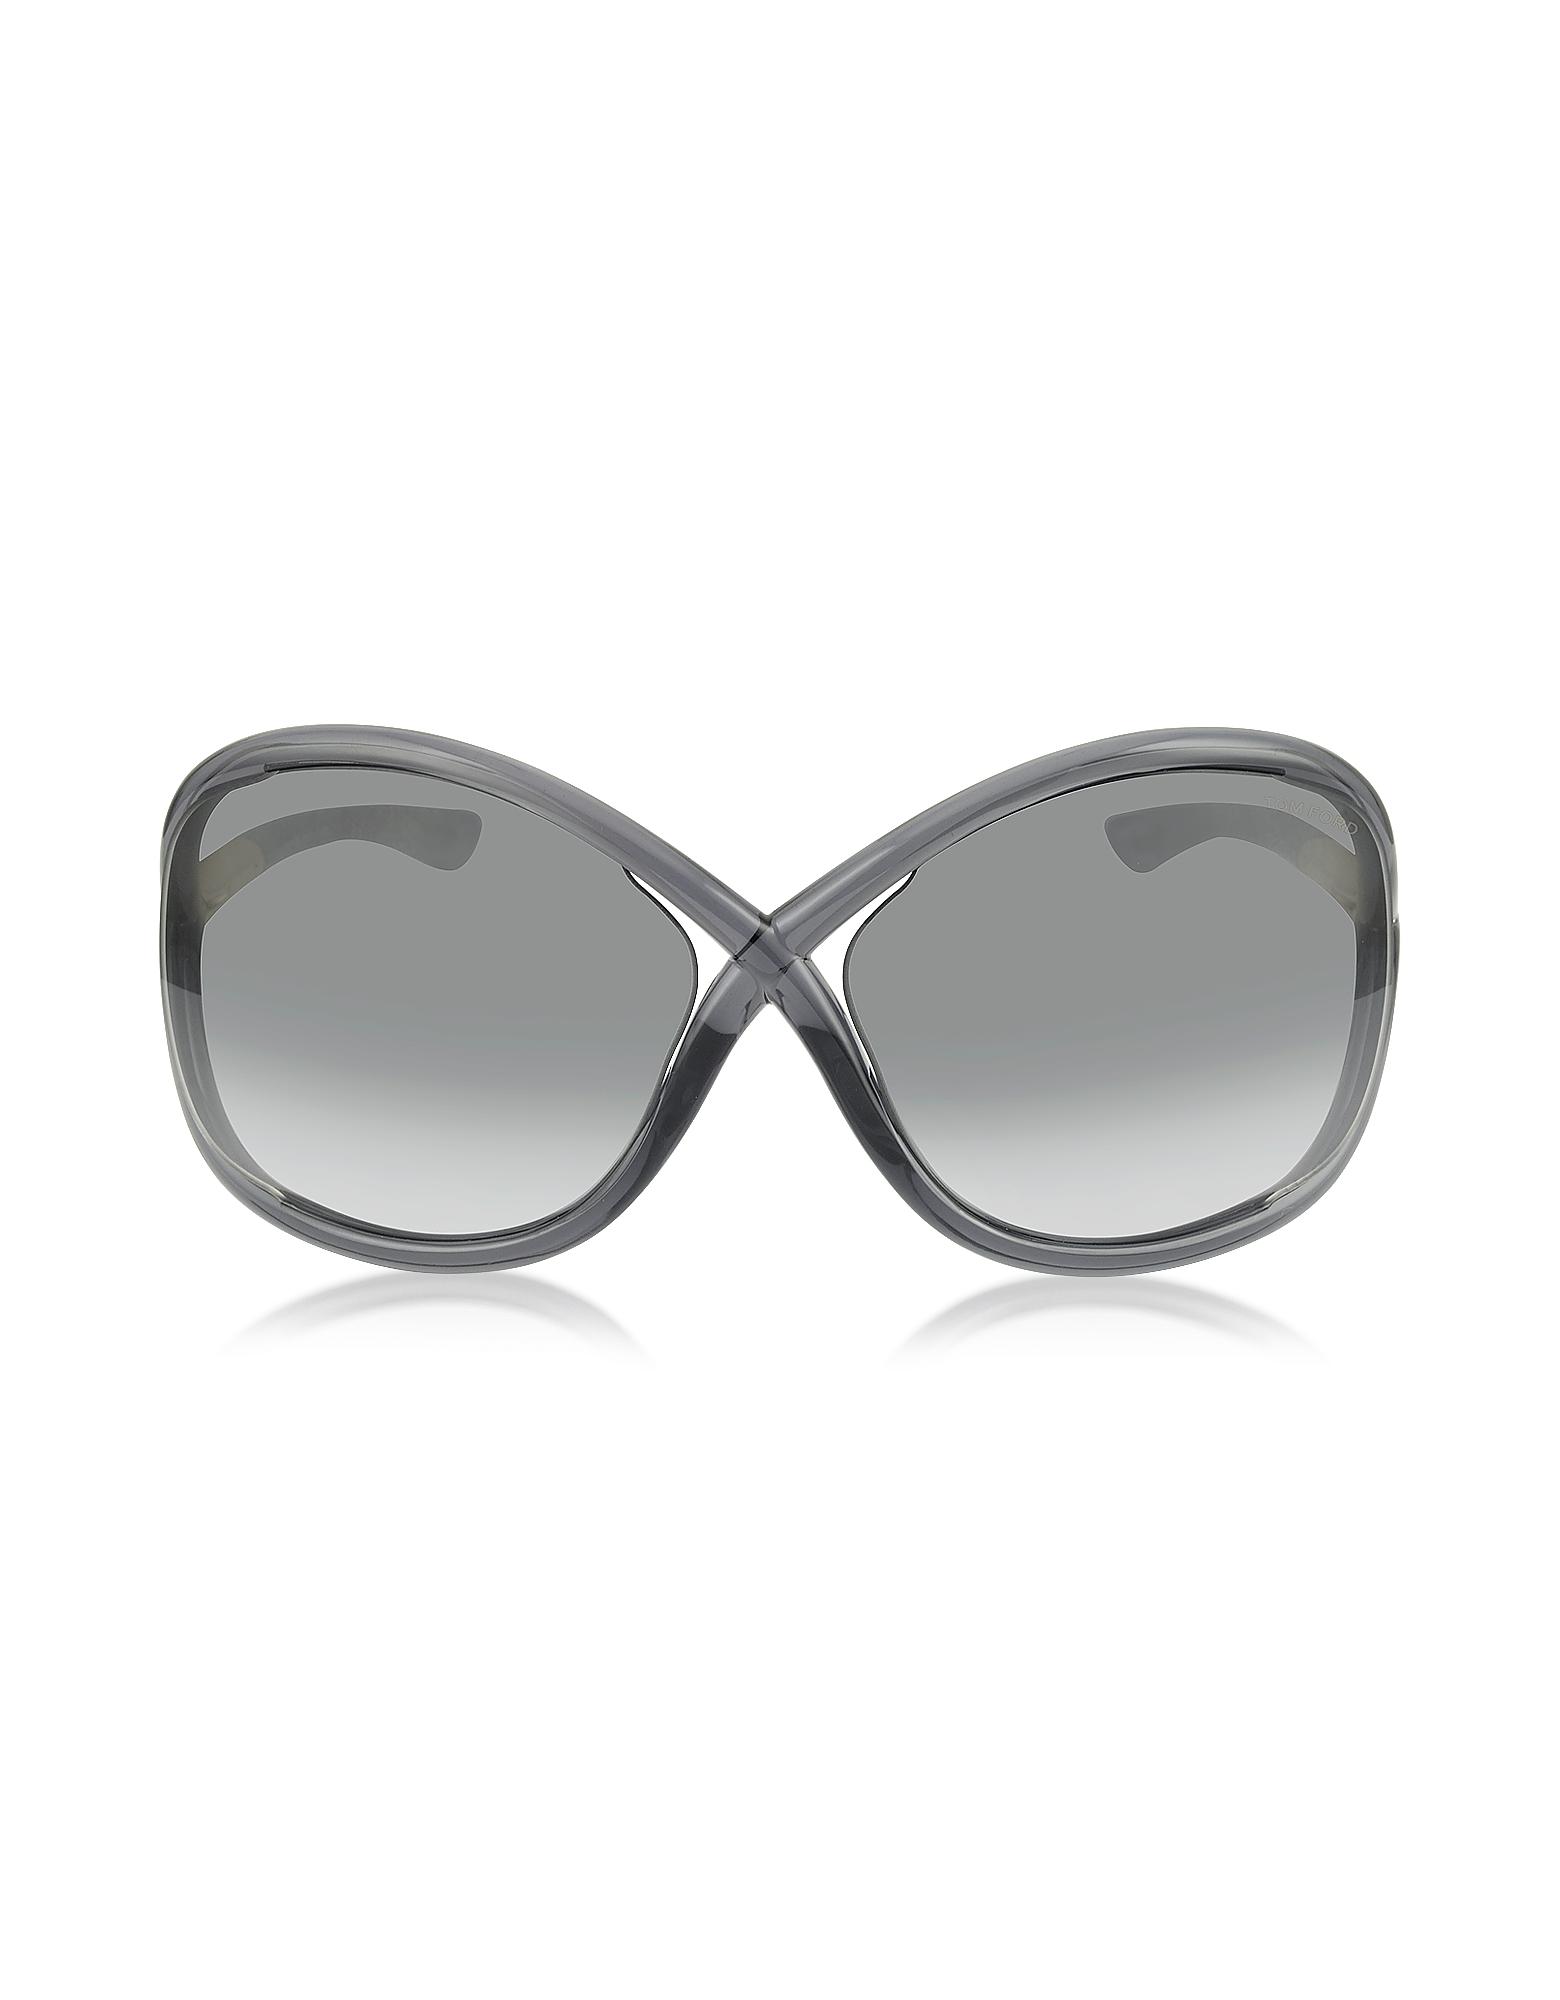 Tom Ford Sunglasses, WHITNEY FT009 B5 Oversized Soft Round Sunglasses